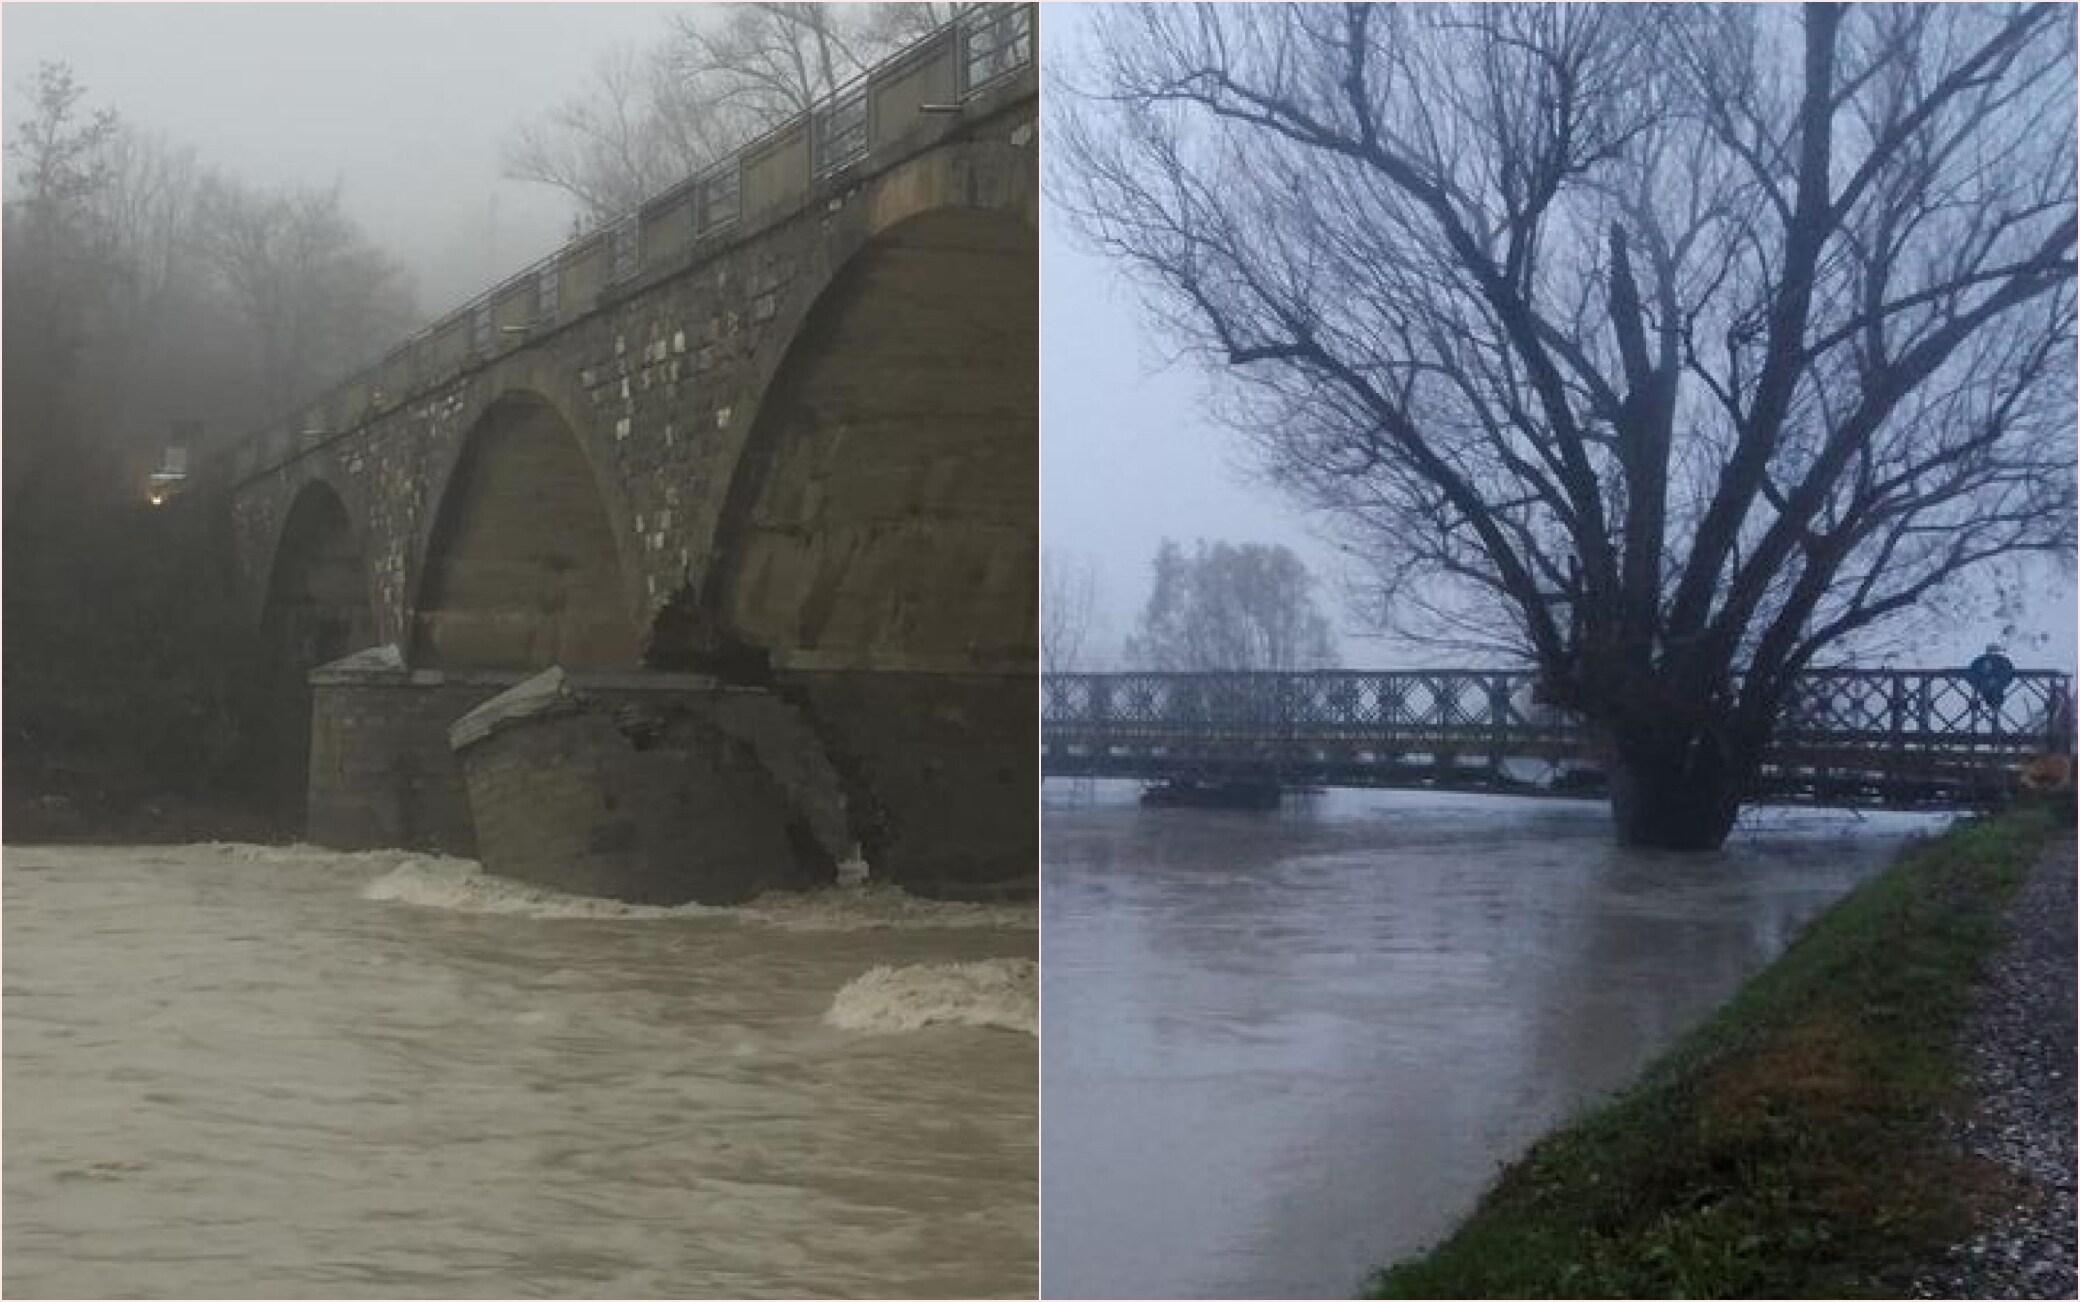 fiume panaro esondato